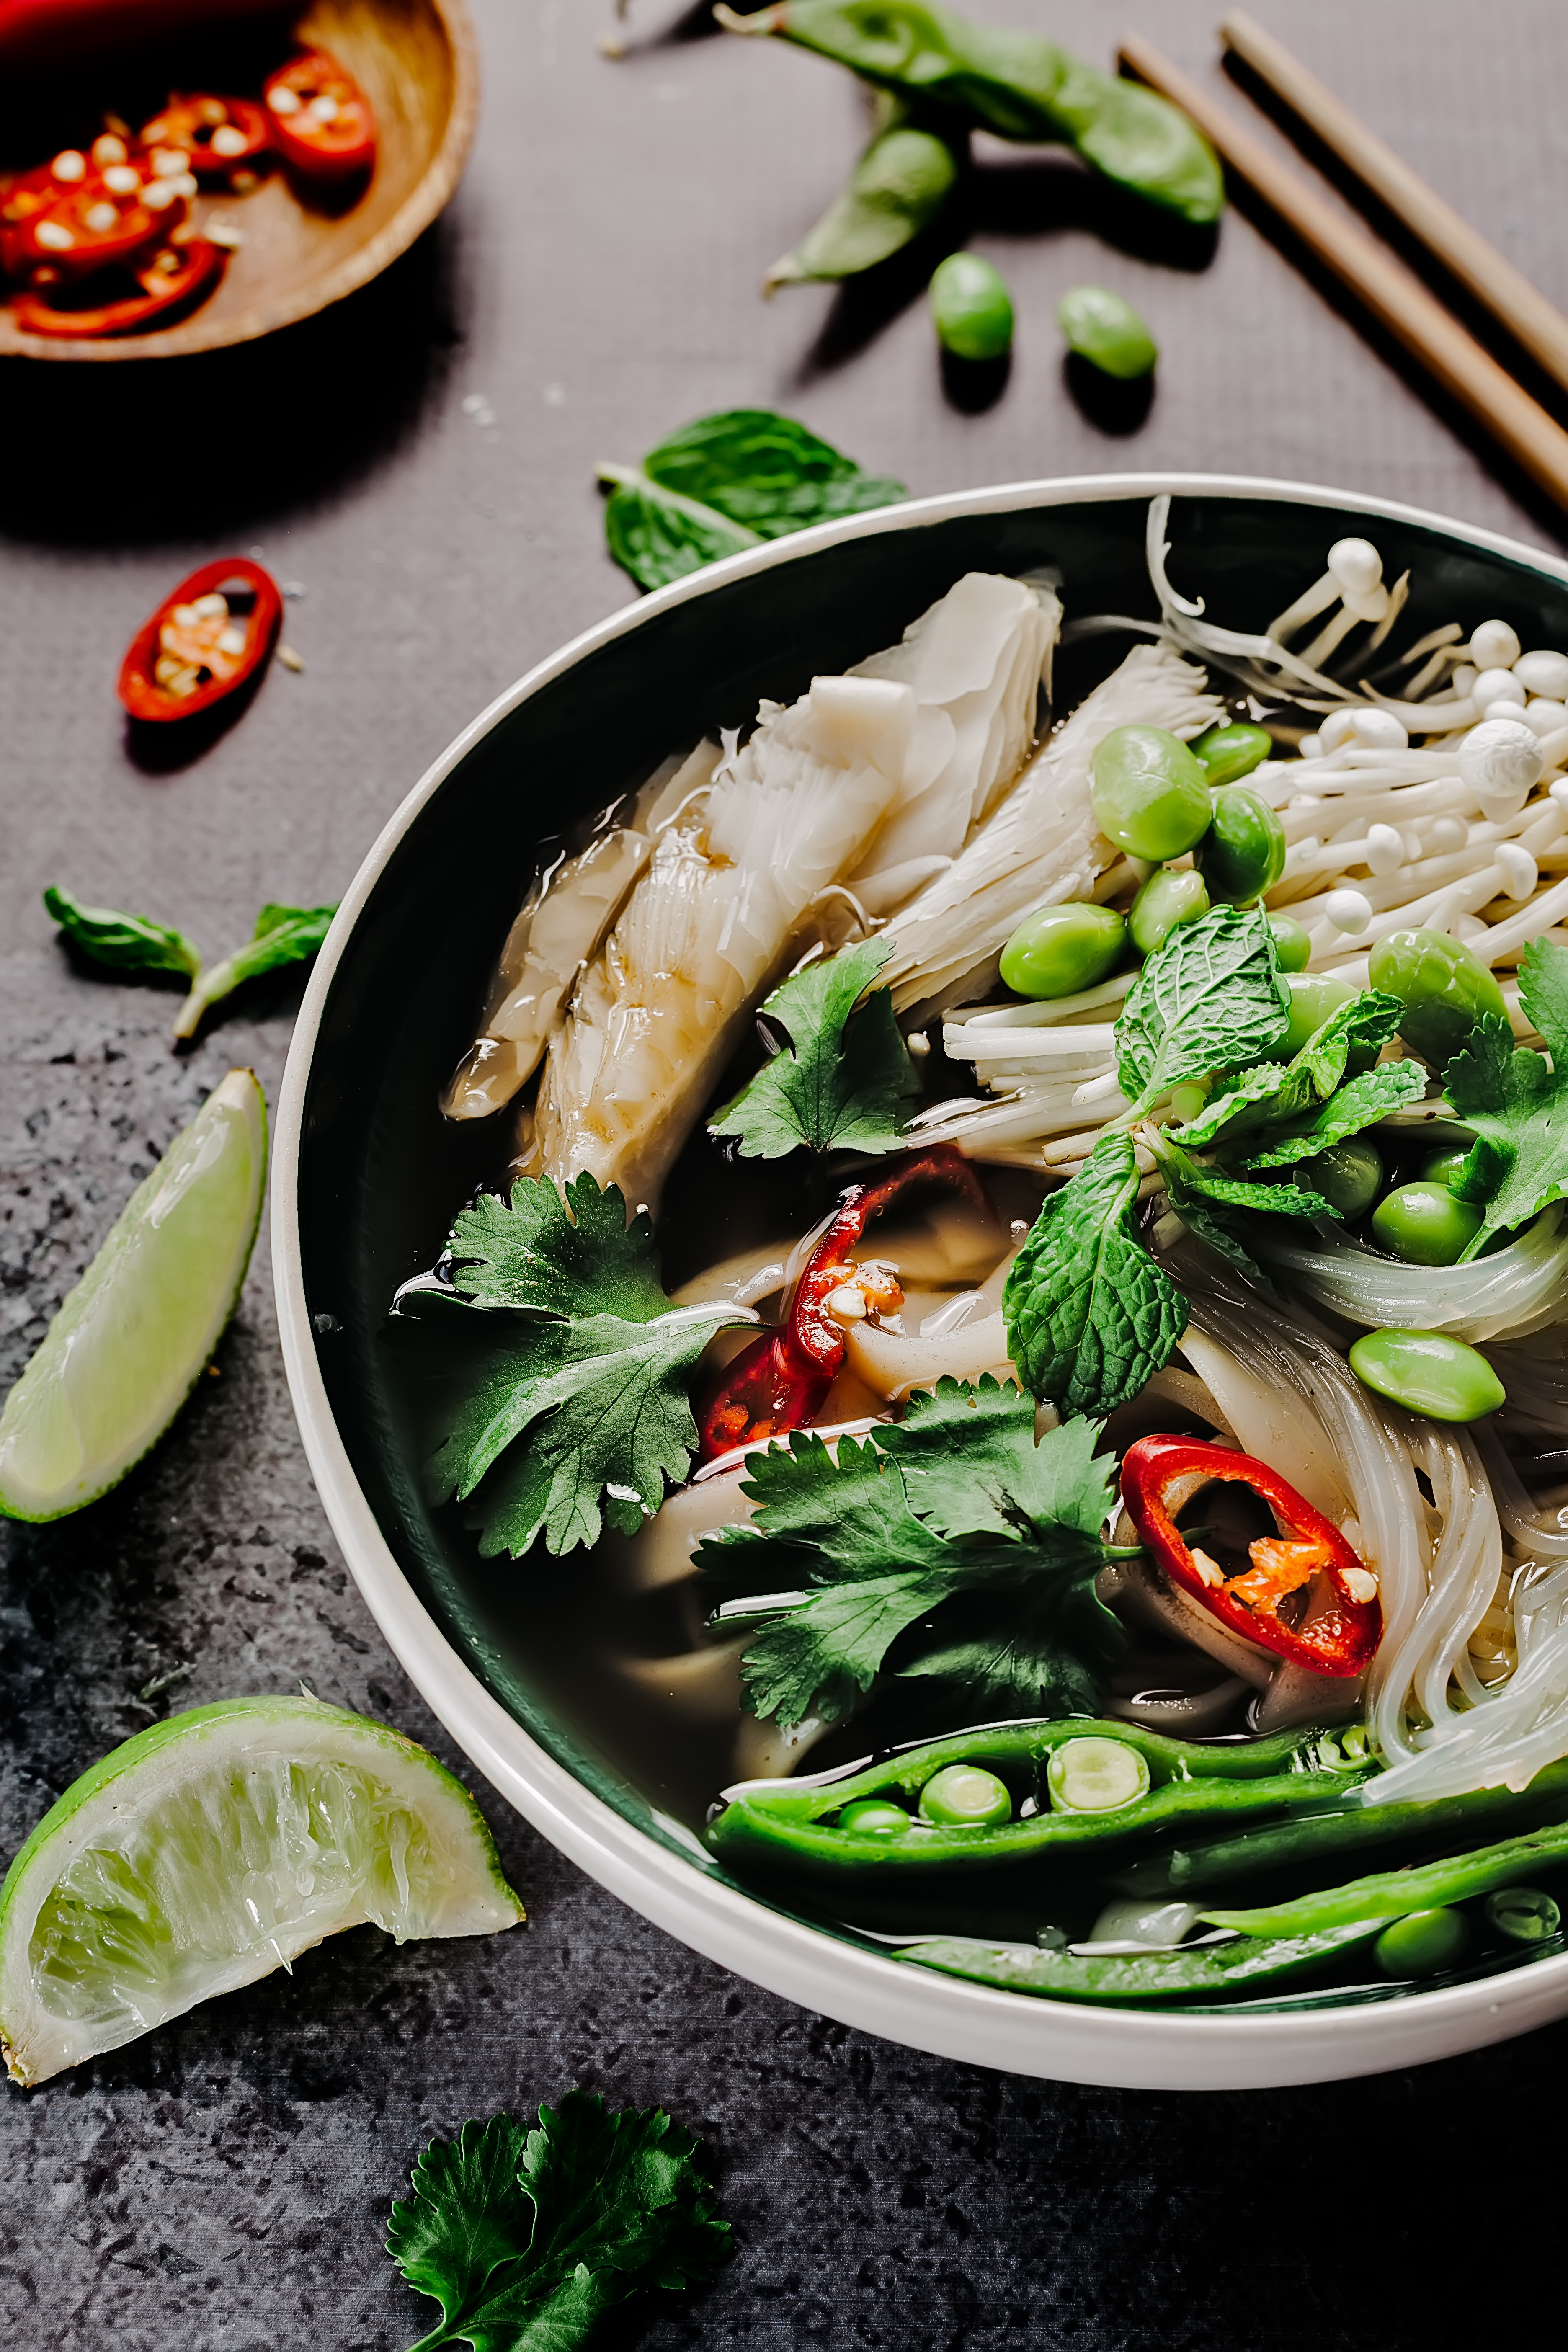 Pho -Vietnamese soup